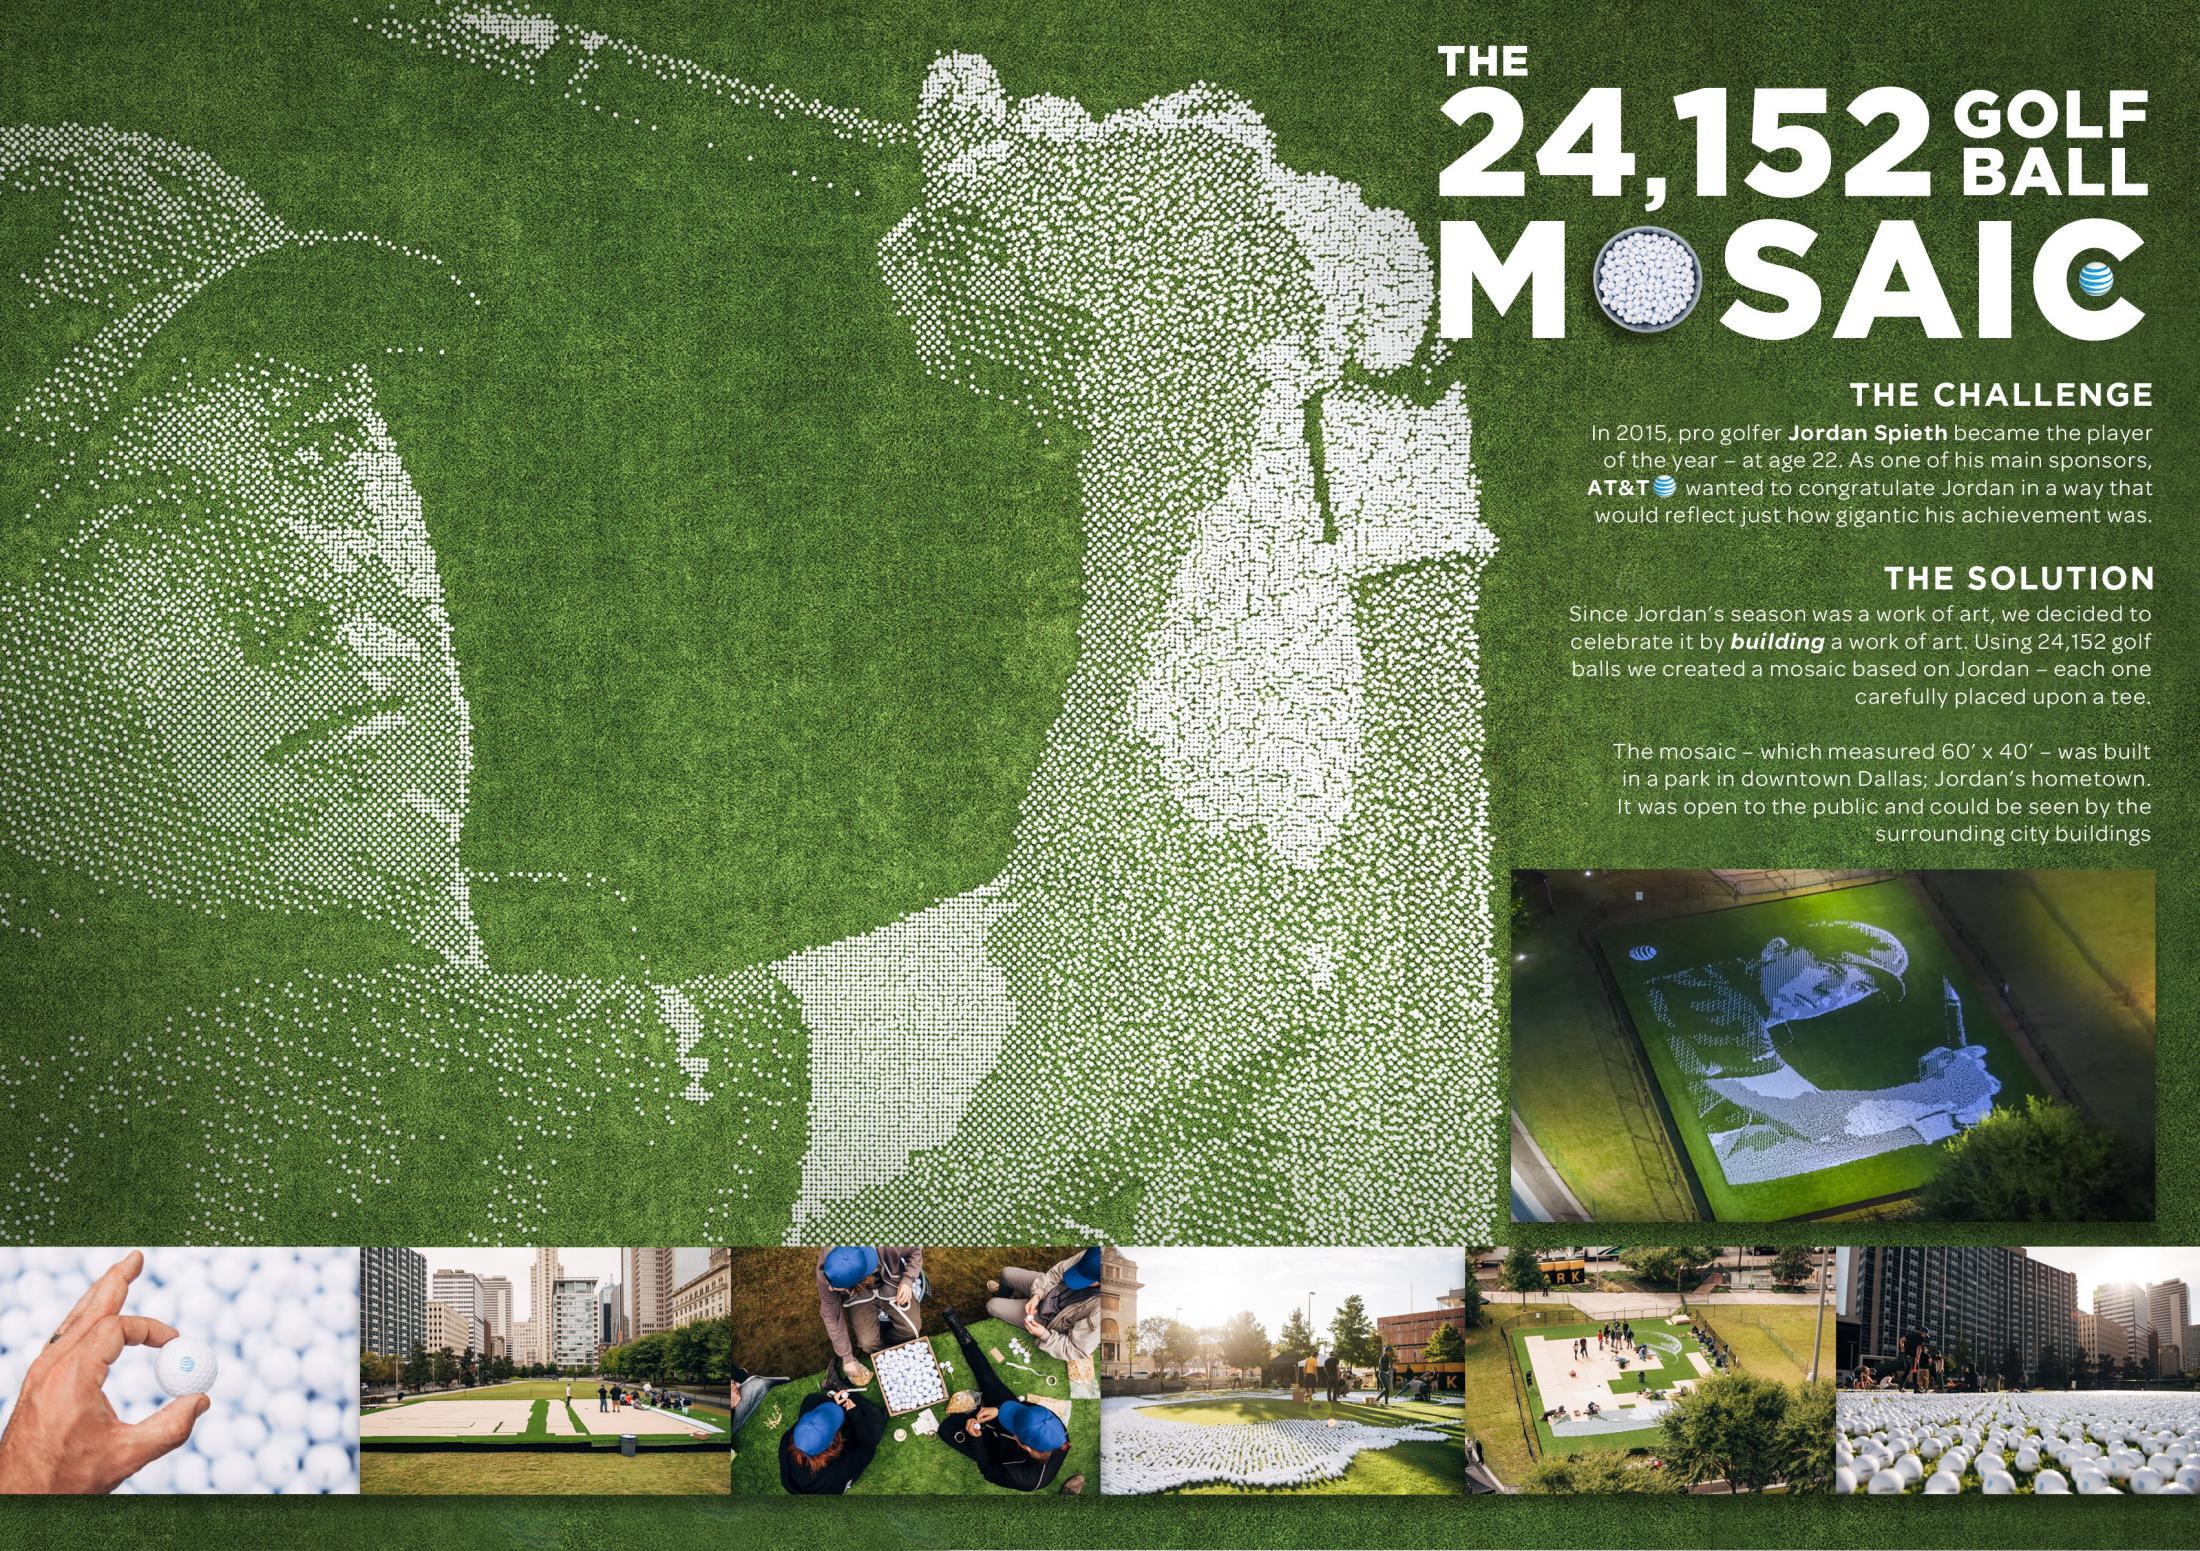 Thumbnail for The 24,152 Golf Ball Mosaic